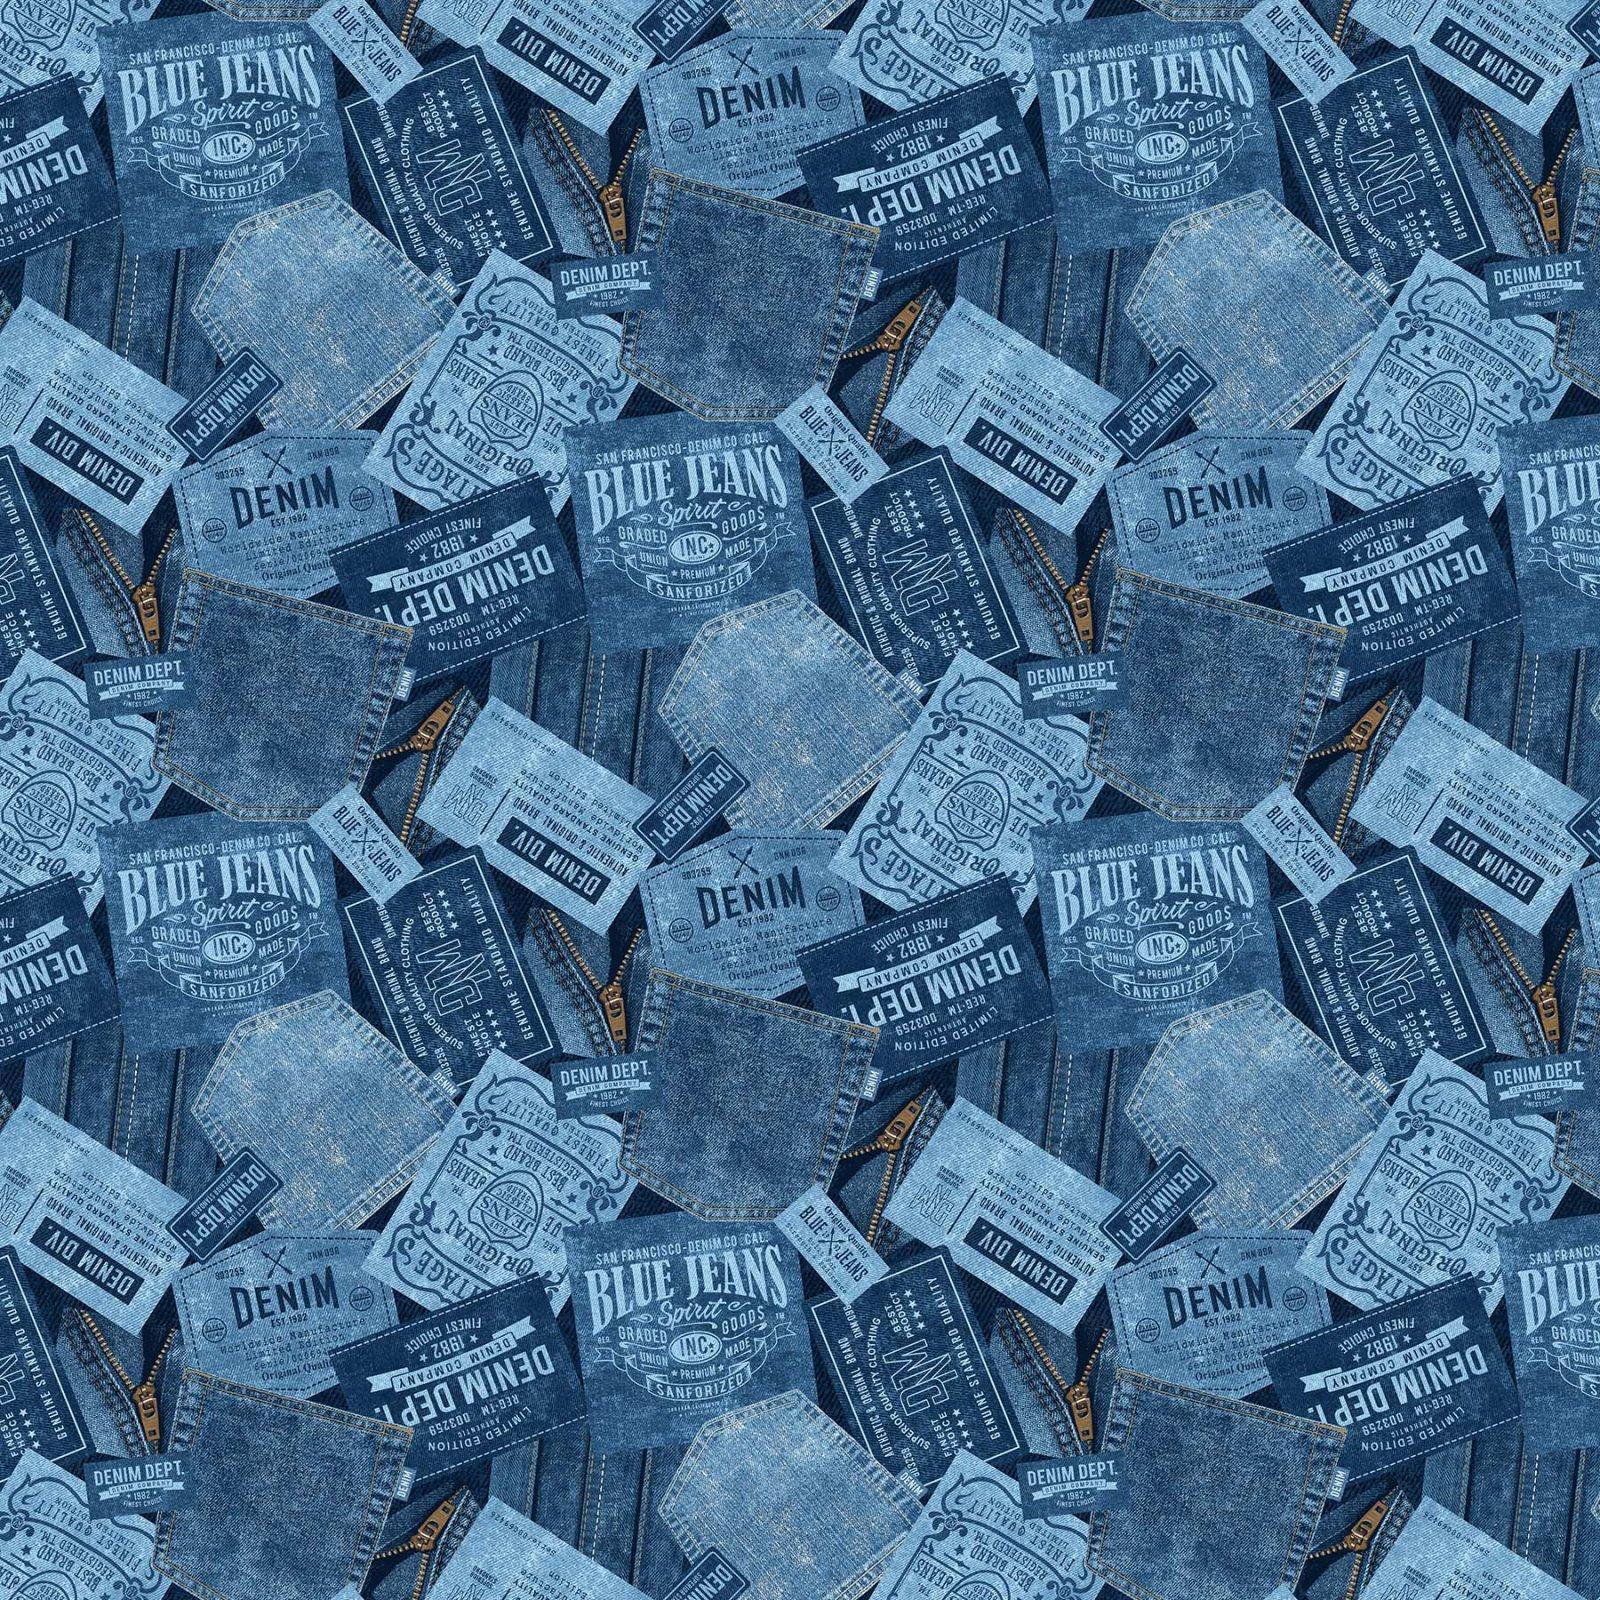 GOT THE BLUES DENIM POCKETS DARK BLUE 23378-48